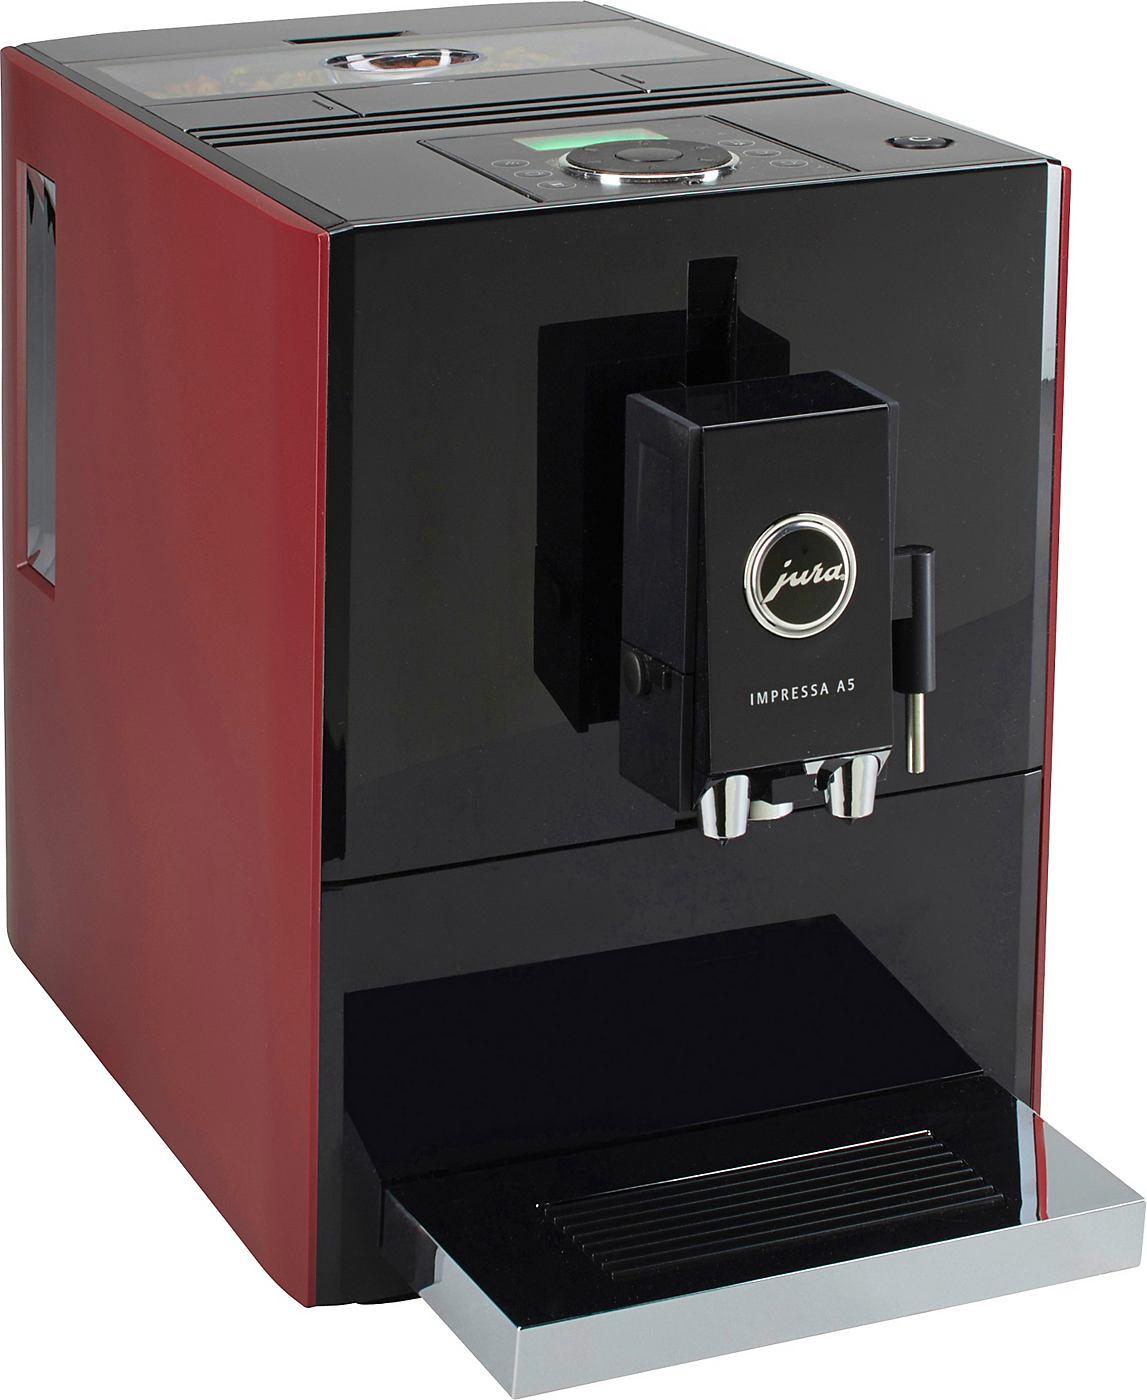 JURA Espresso-/Kaffee-Vollautomat »IMPRESSA A5 One Touch 13756«